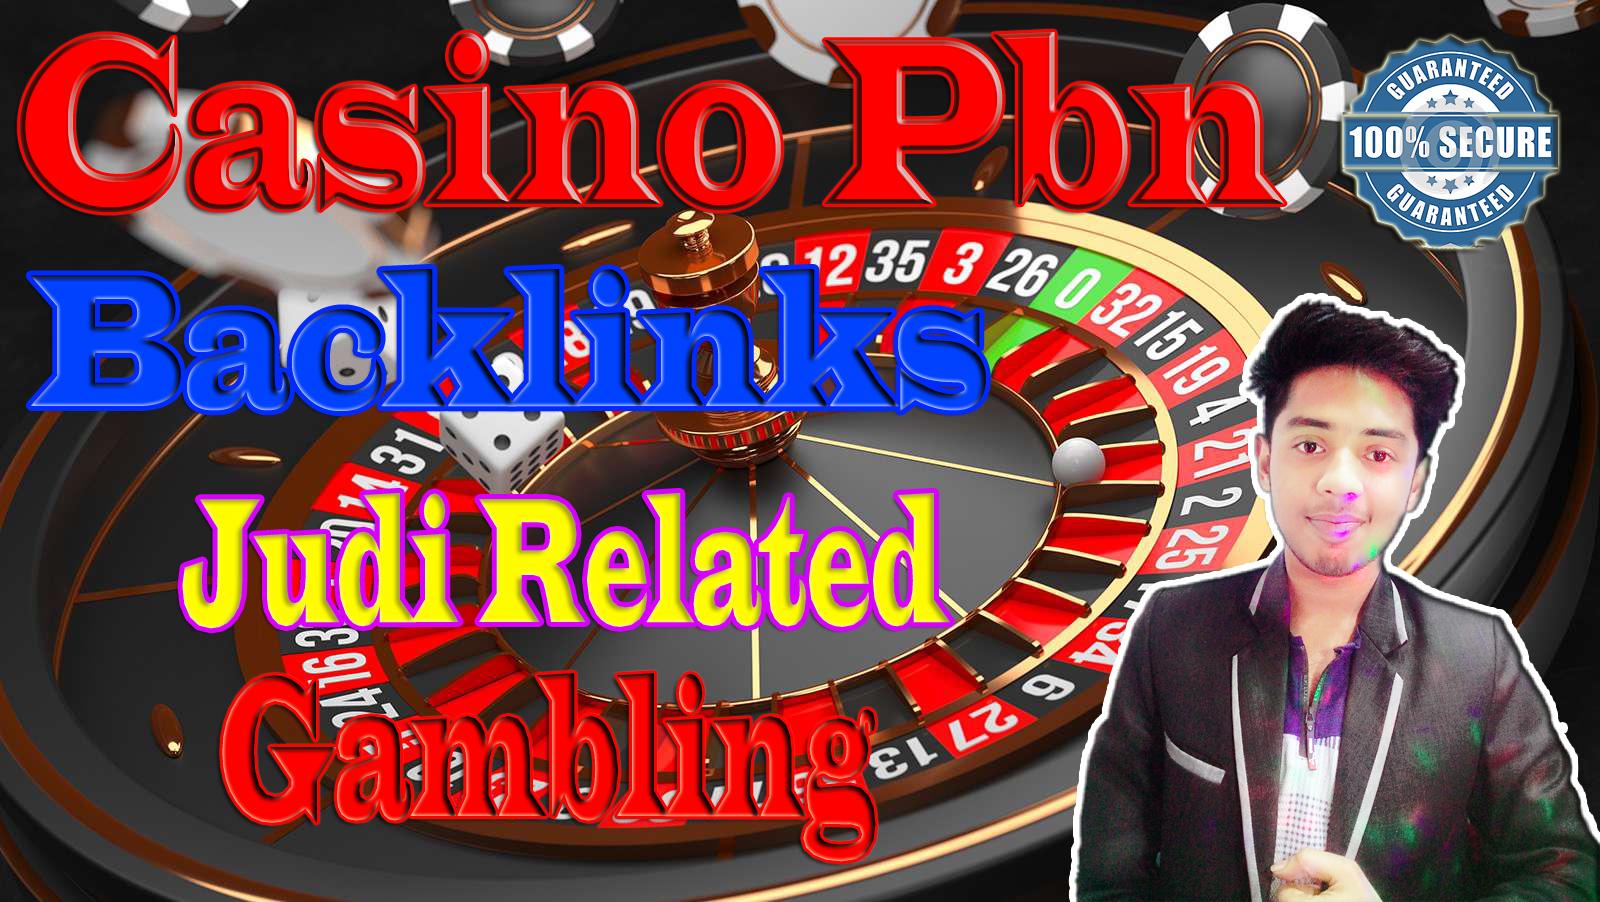 650+ Casino Pbn Backlink,  judi,  Poker Related Casino Gambling,  Top Rank Your Casino Website